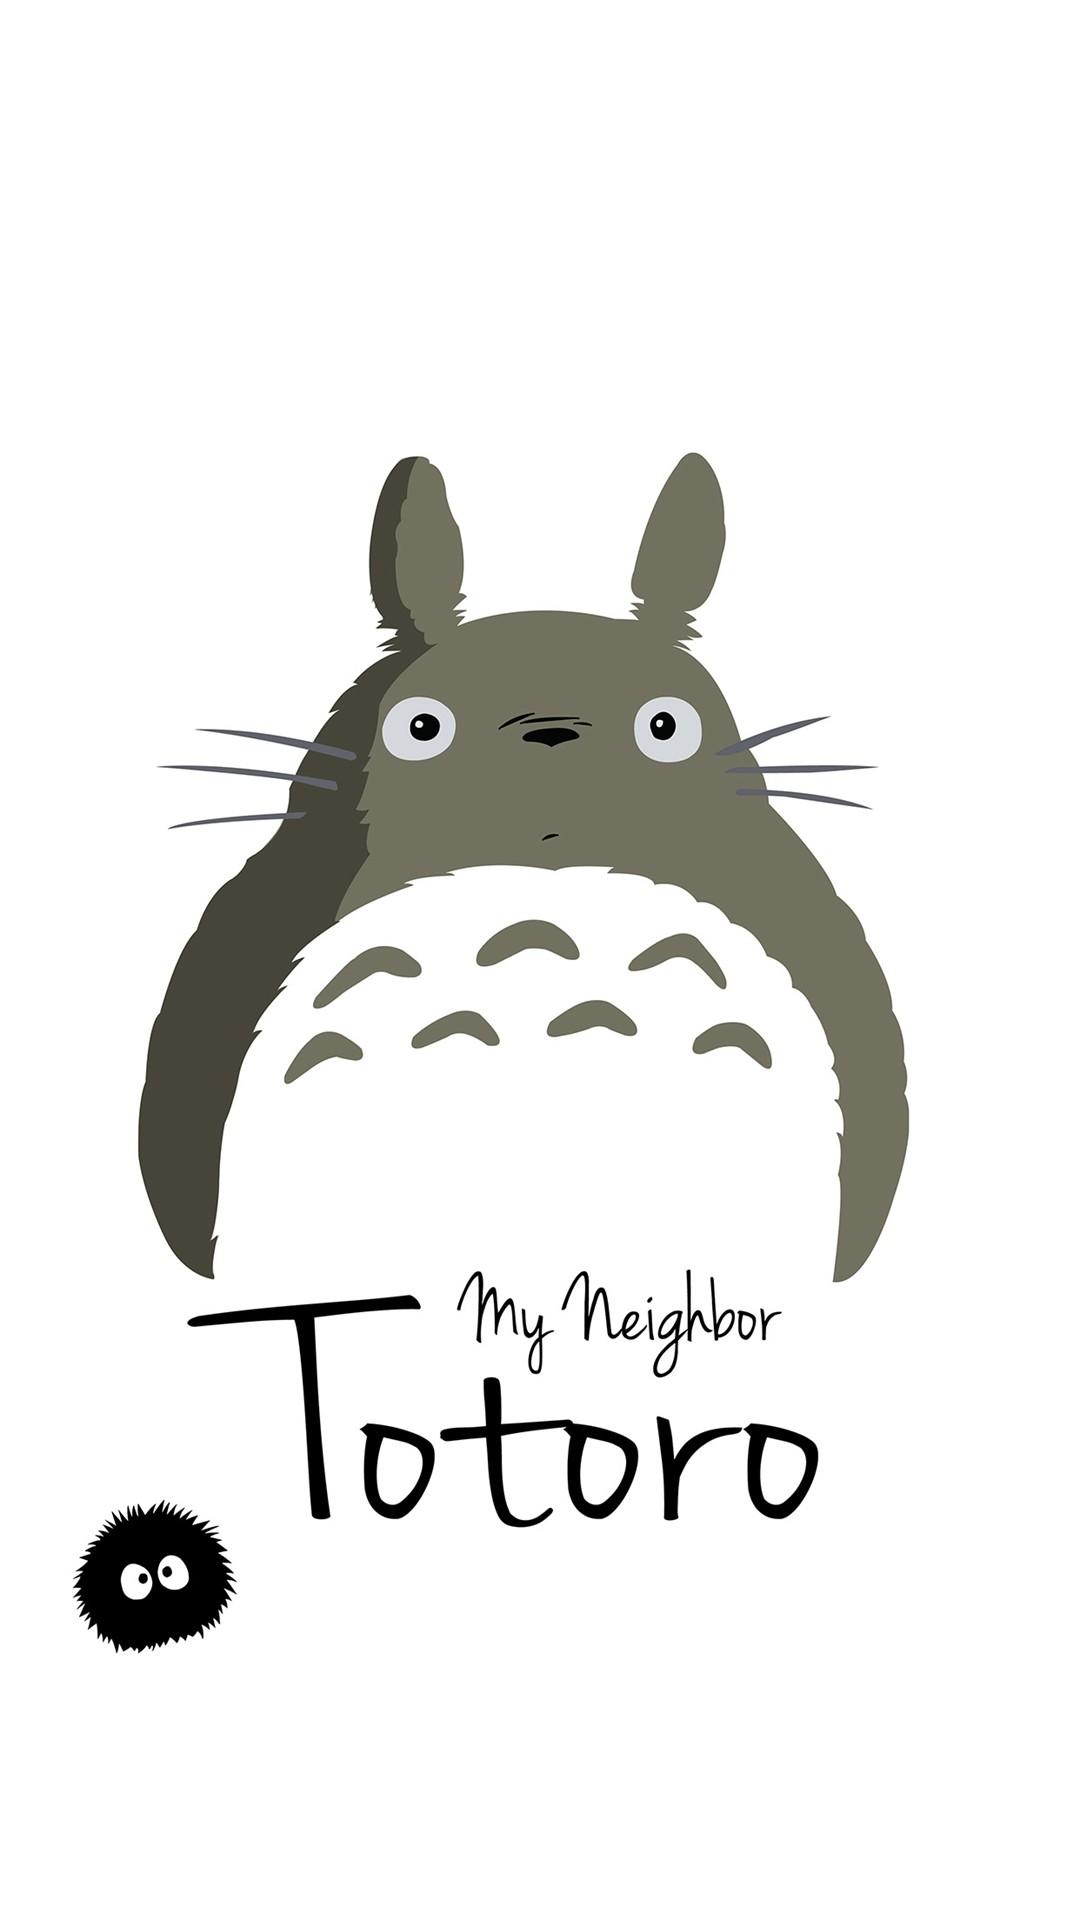 My Neighbor Totoro Art Minimal iPhone 6 wallpaper